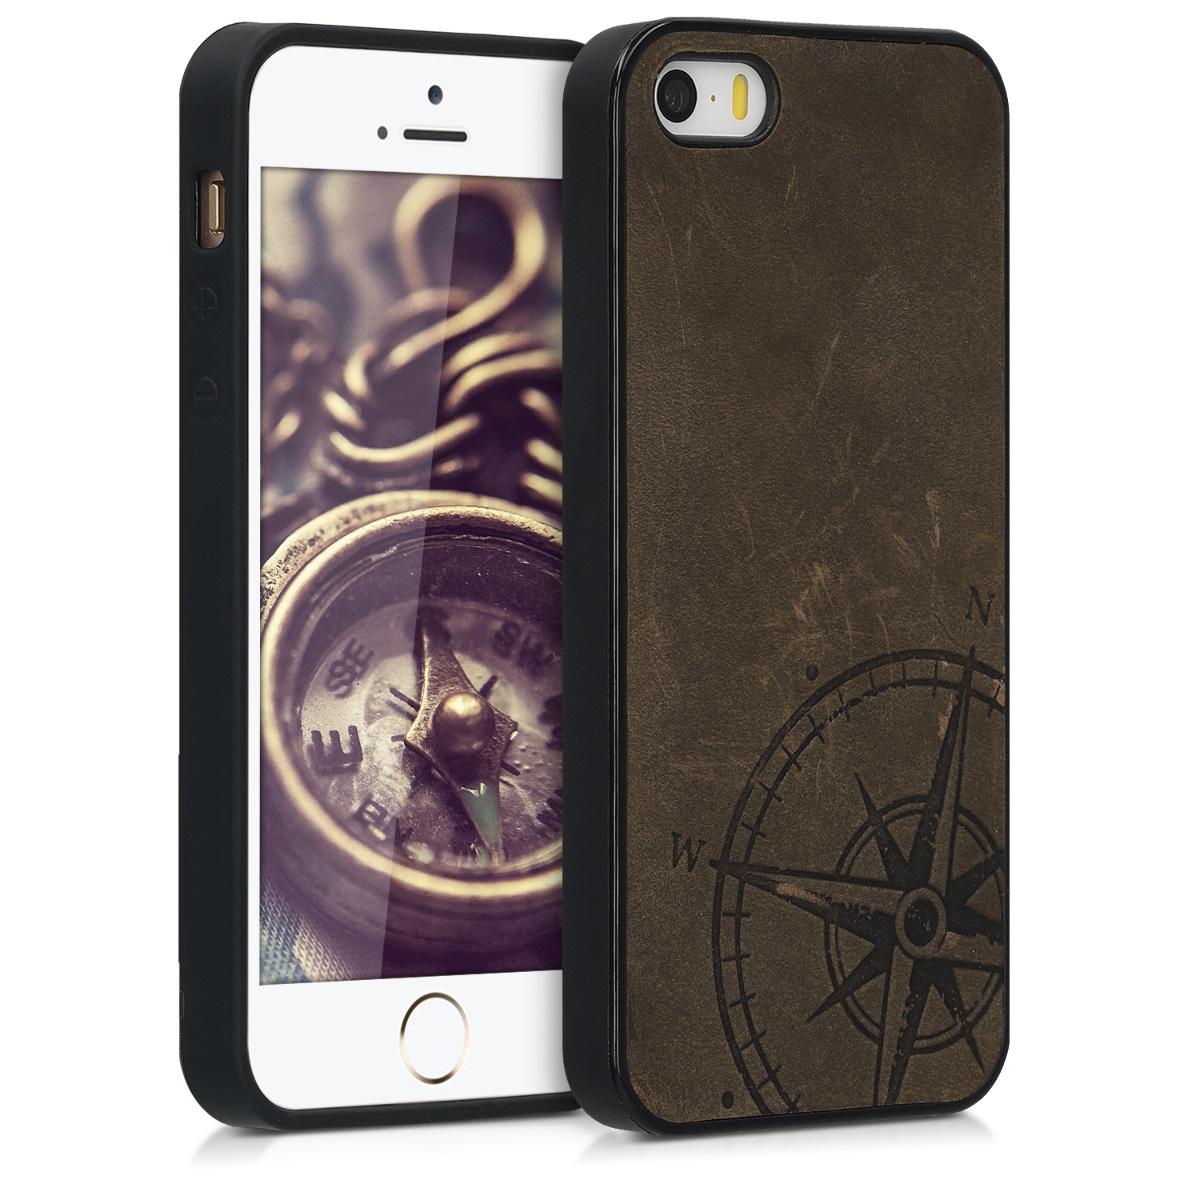 Kalibri Δερμάτινη Θήκη iPhone SE / 5 / 5S - Brown (46670.01)